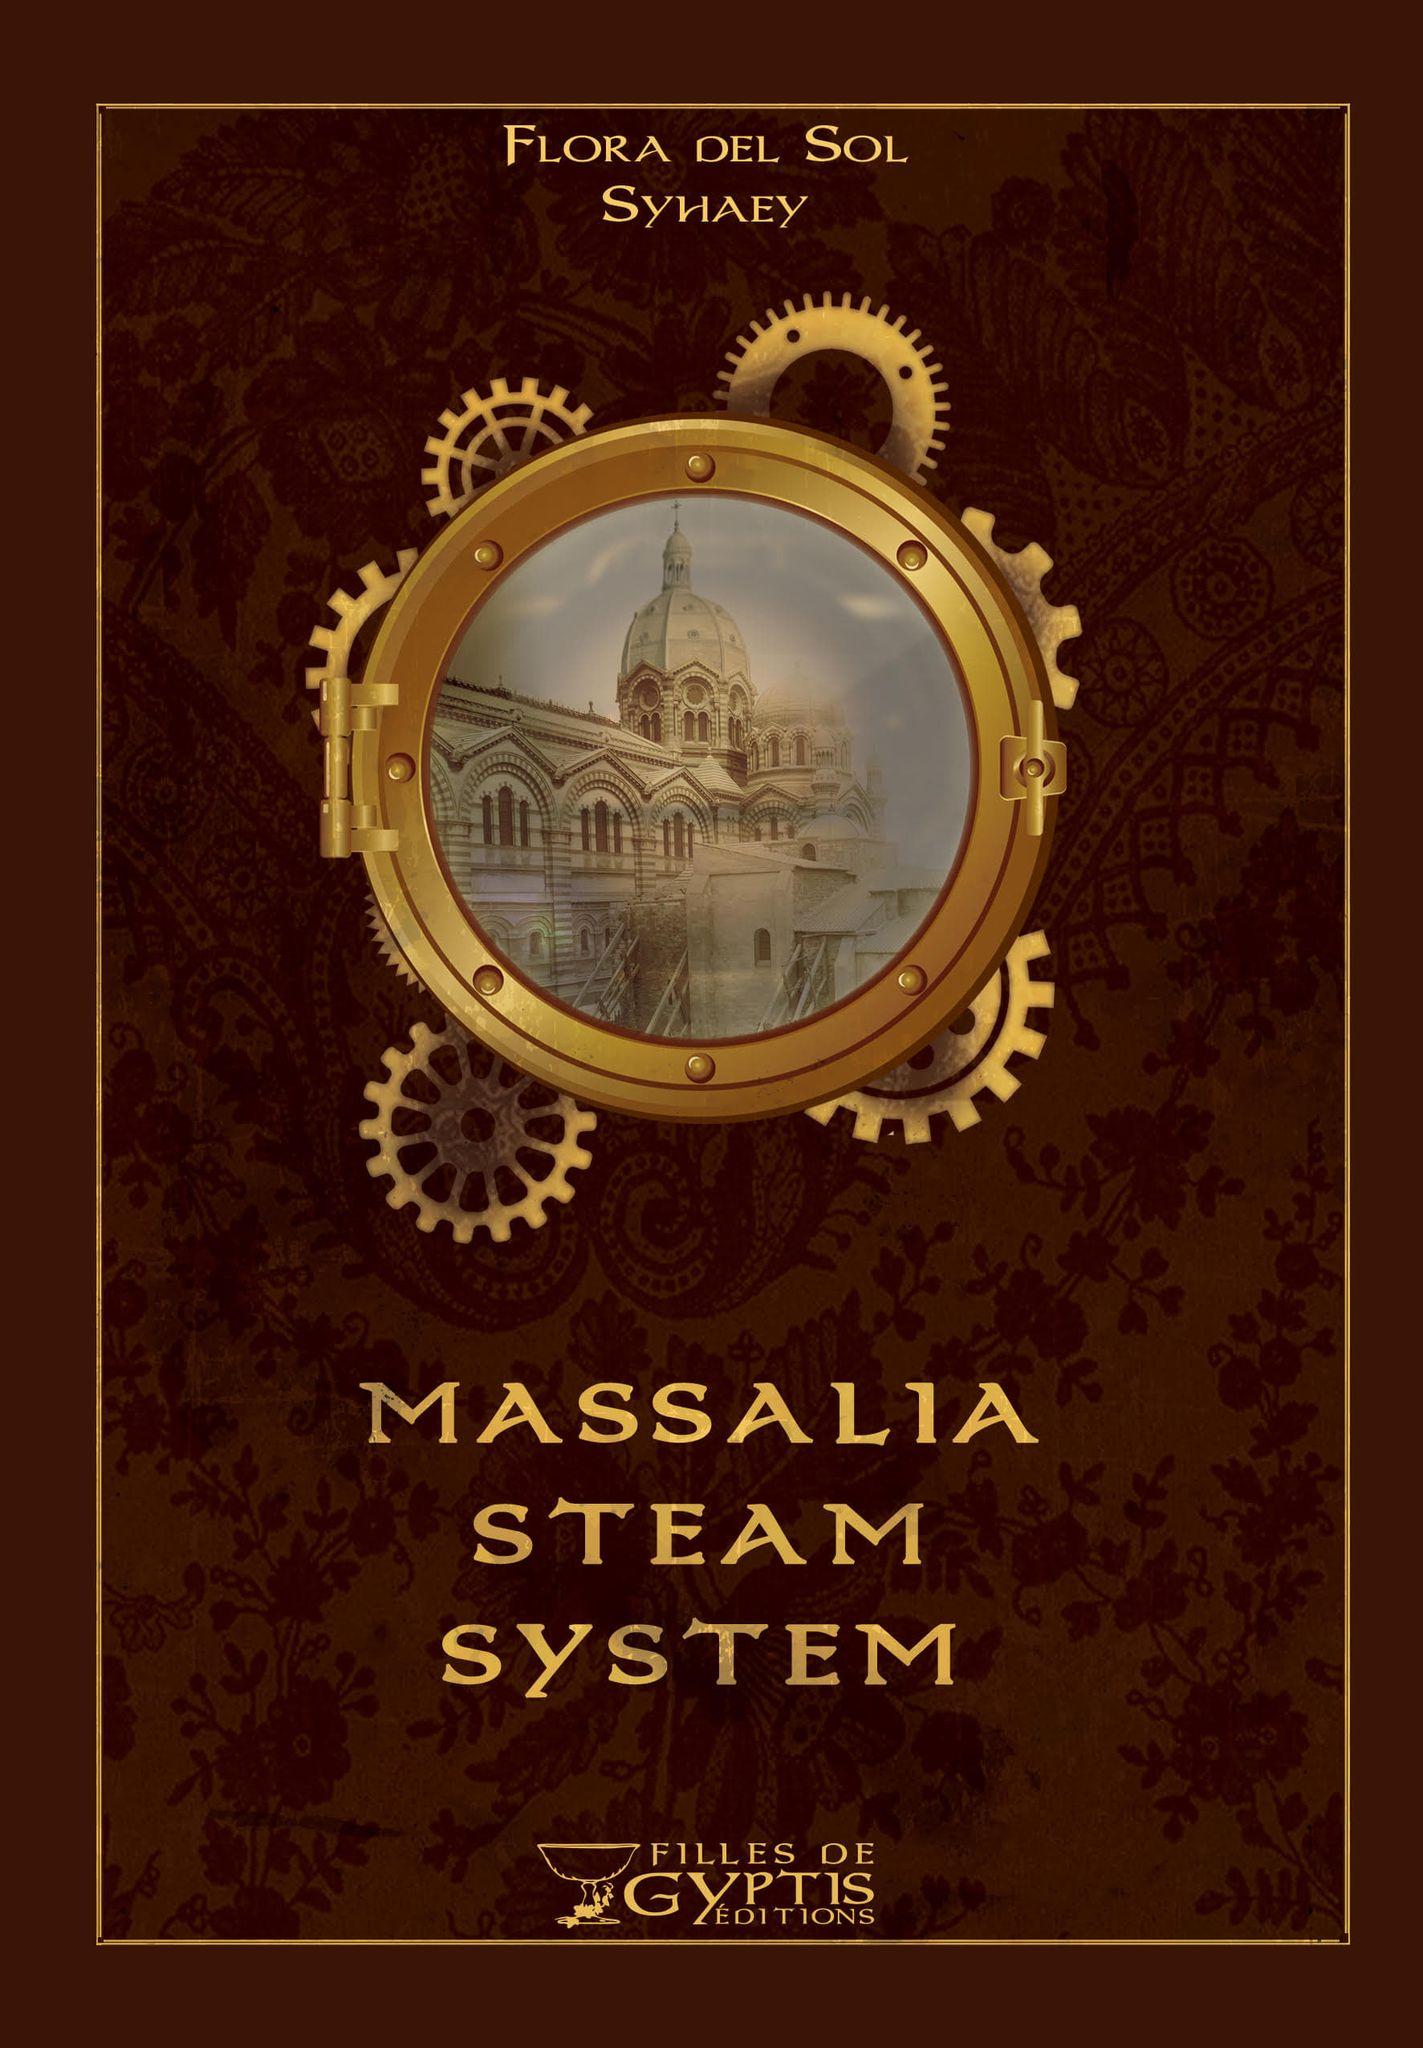 Massalia steam system- Filles de Gyptis Editions